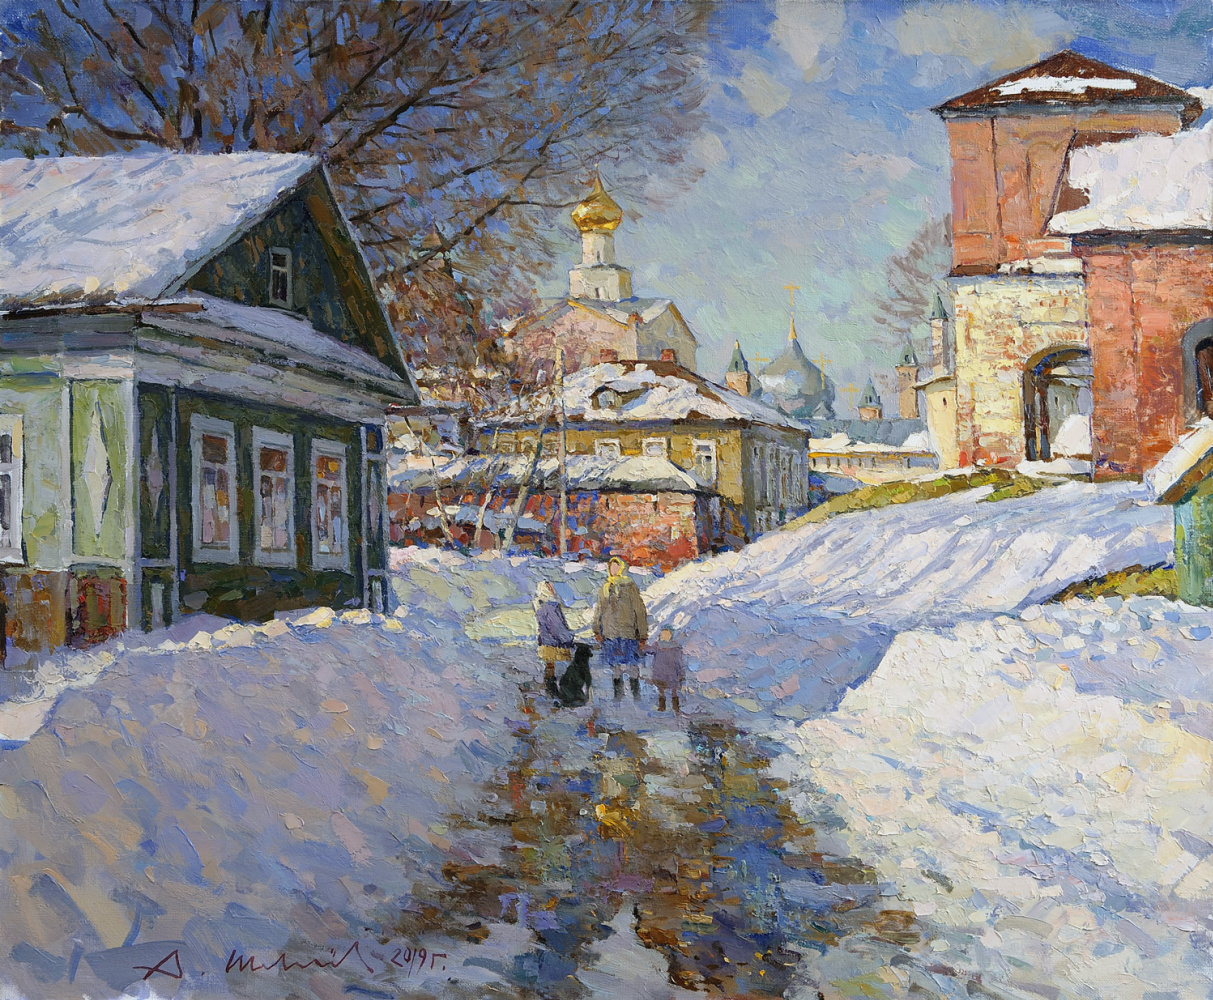 Alexander Victorovich Shevelyov. March in Rostov the Great. Oil on canvas 60.5 x 70.5 cm. 2019